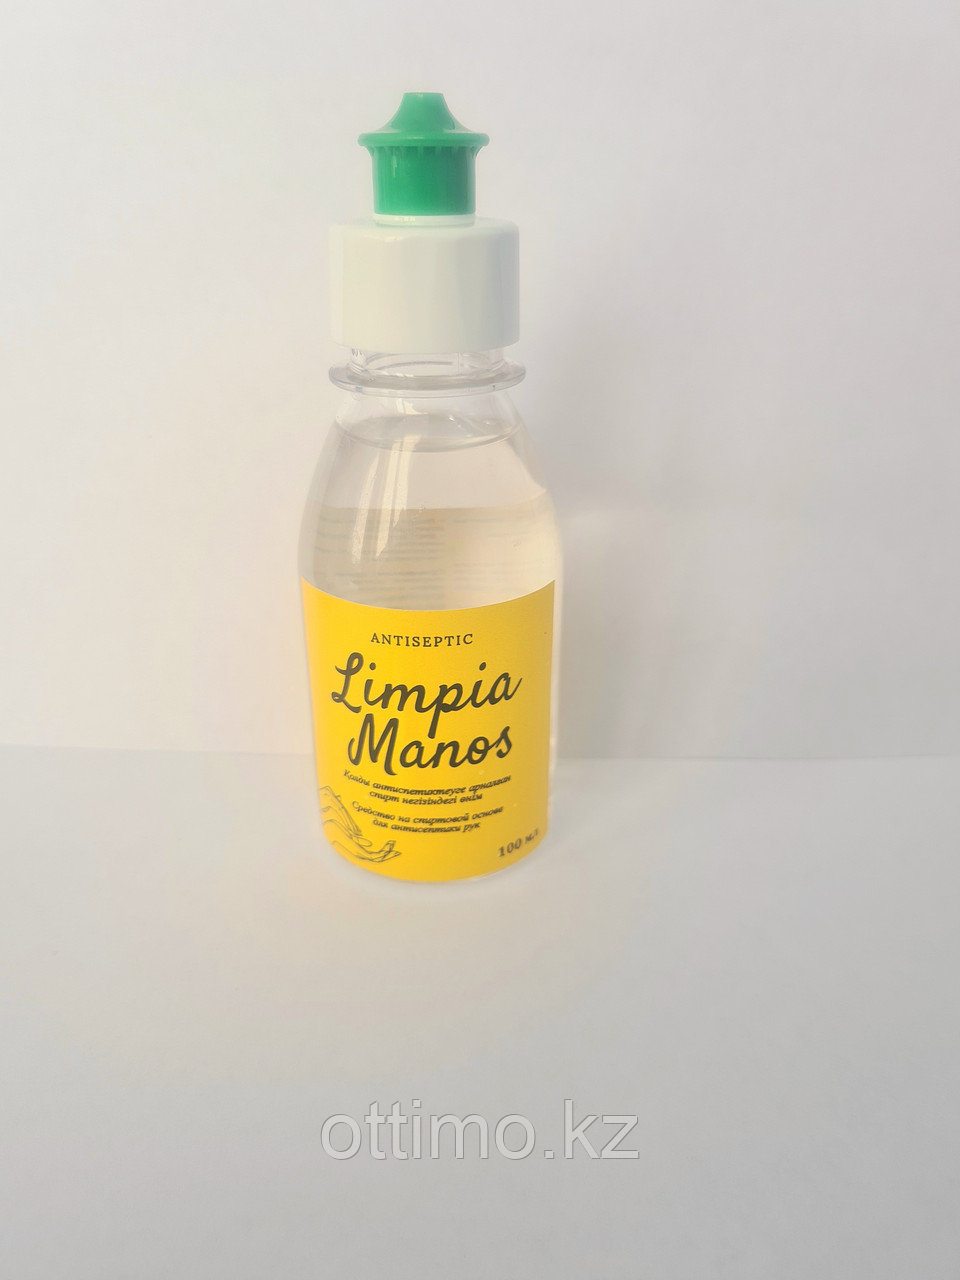 Антисептик для рук Limpia Manos 100 мл